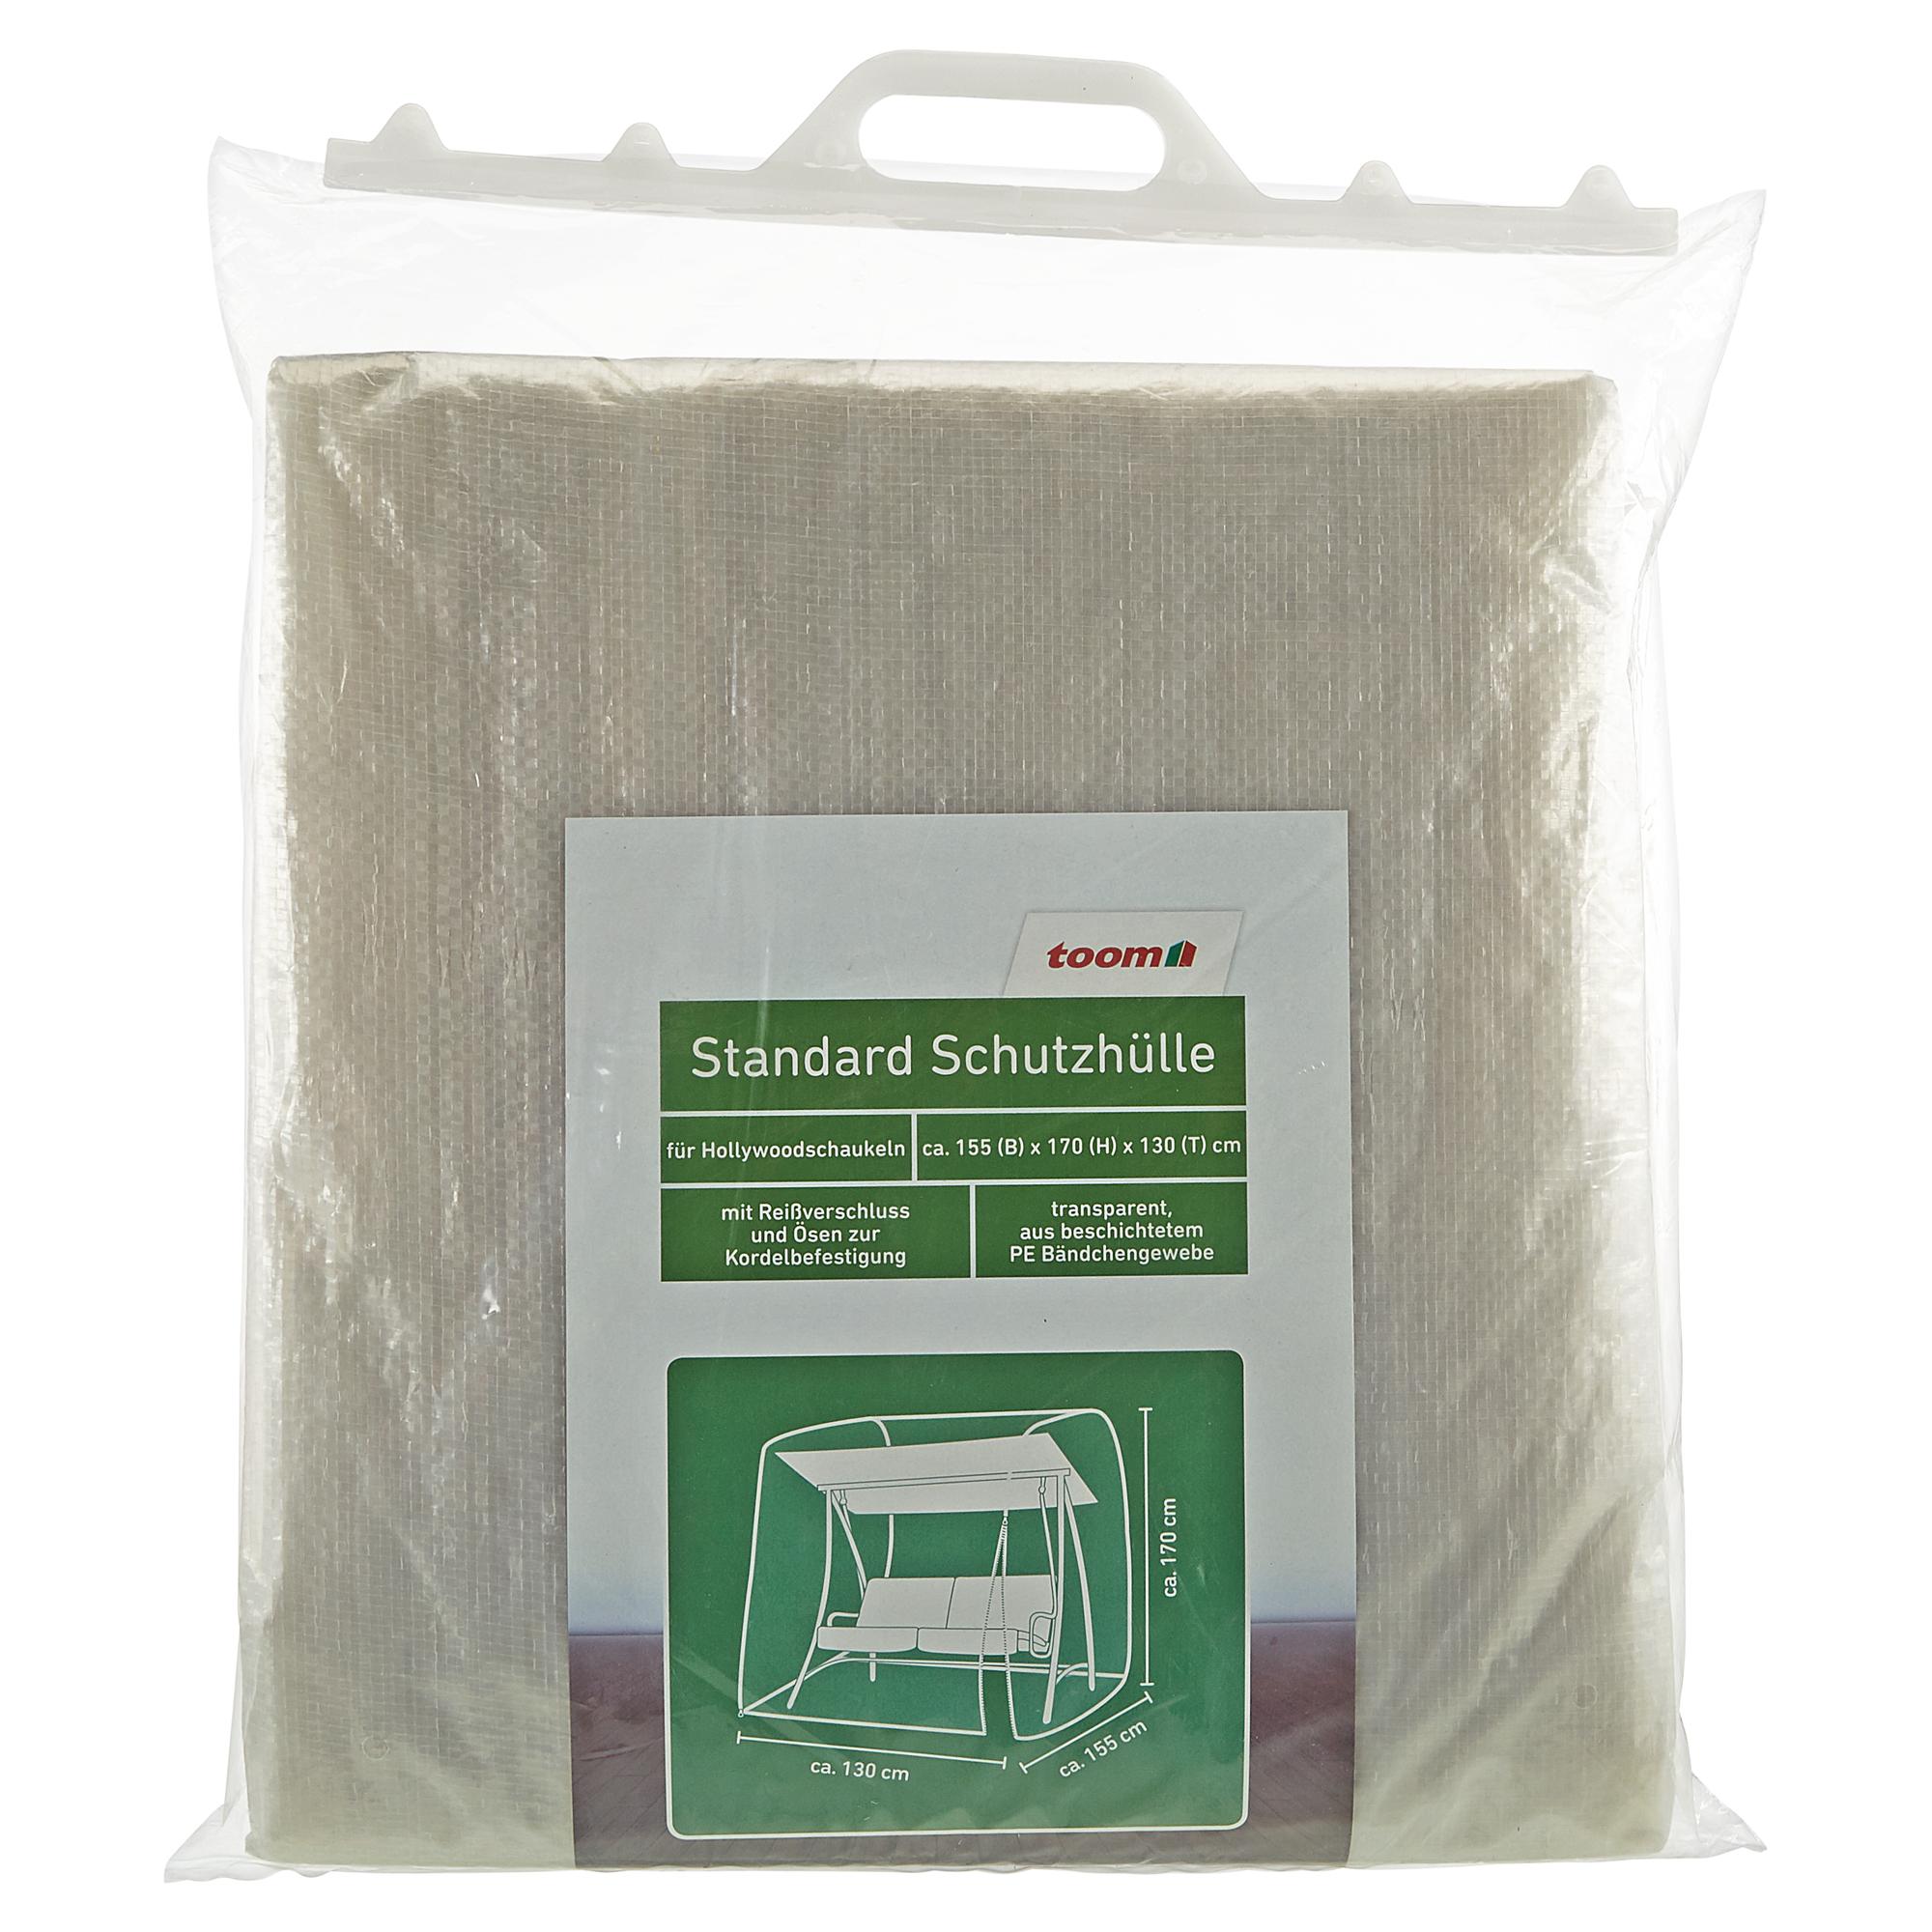 Toom Standard Schutzhülle Für Hollywoodschaukel PE Bändchengewebe  Transparent 155 X 170 X 130 Cm .